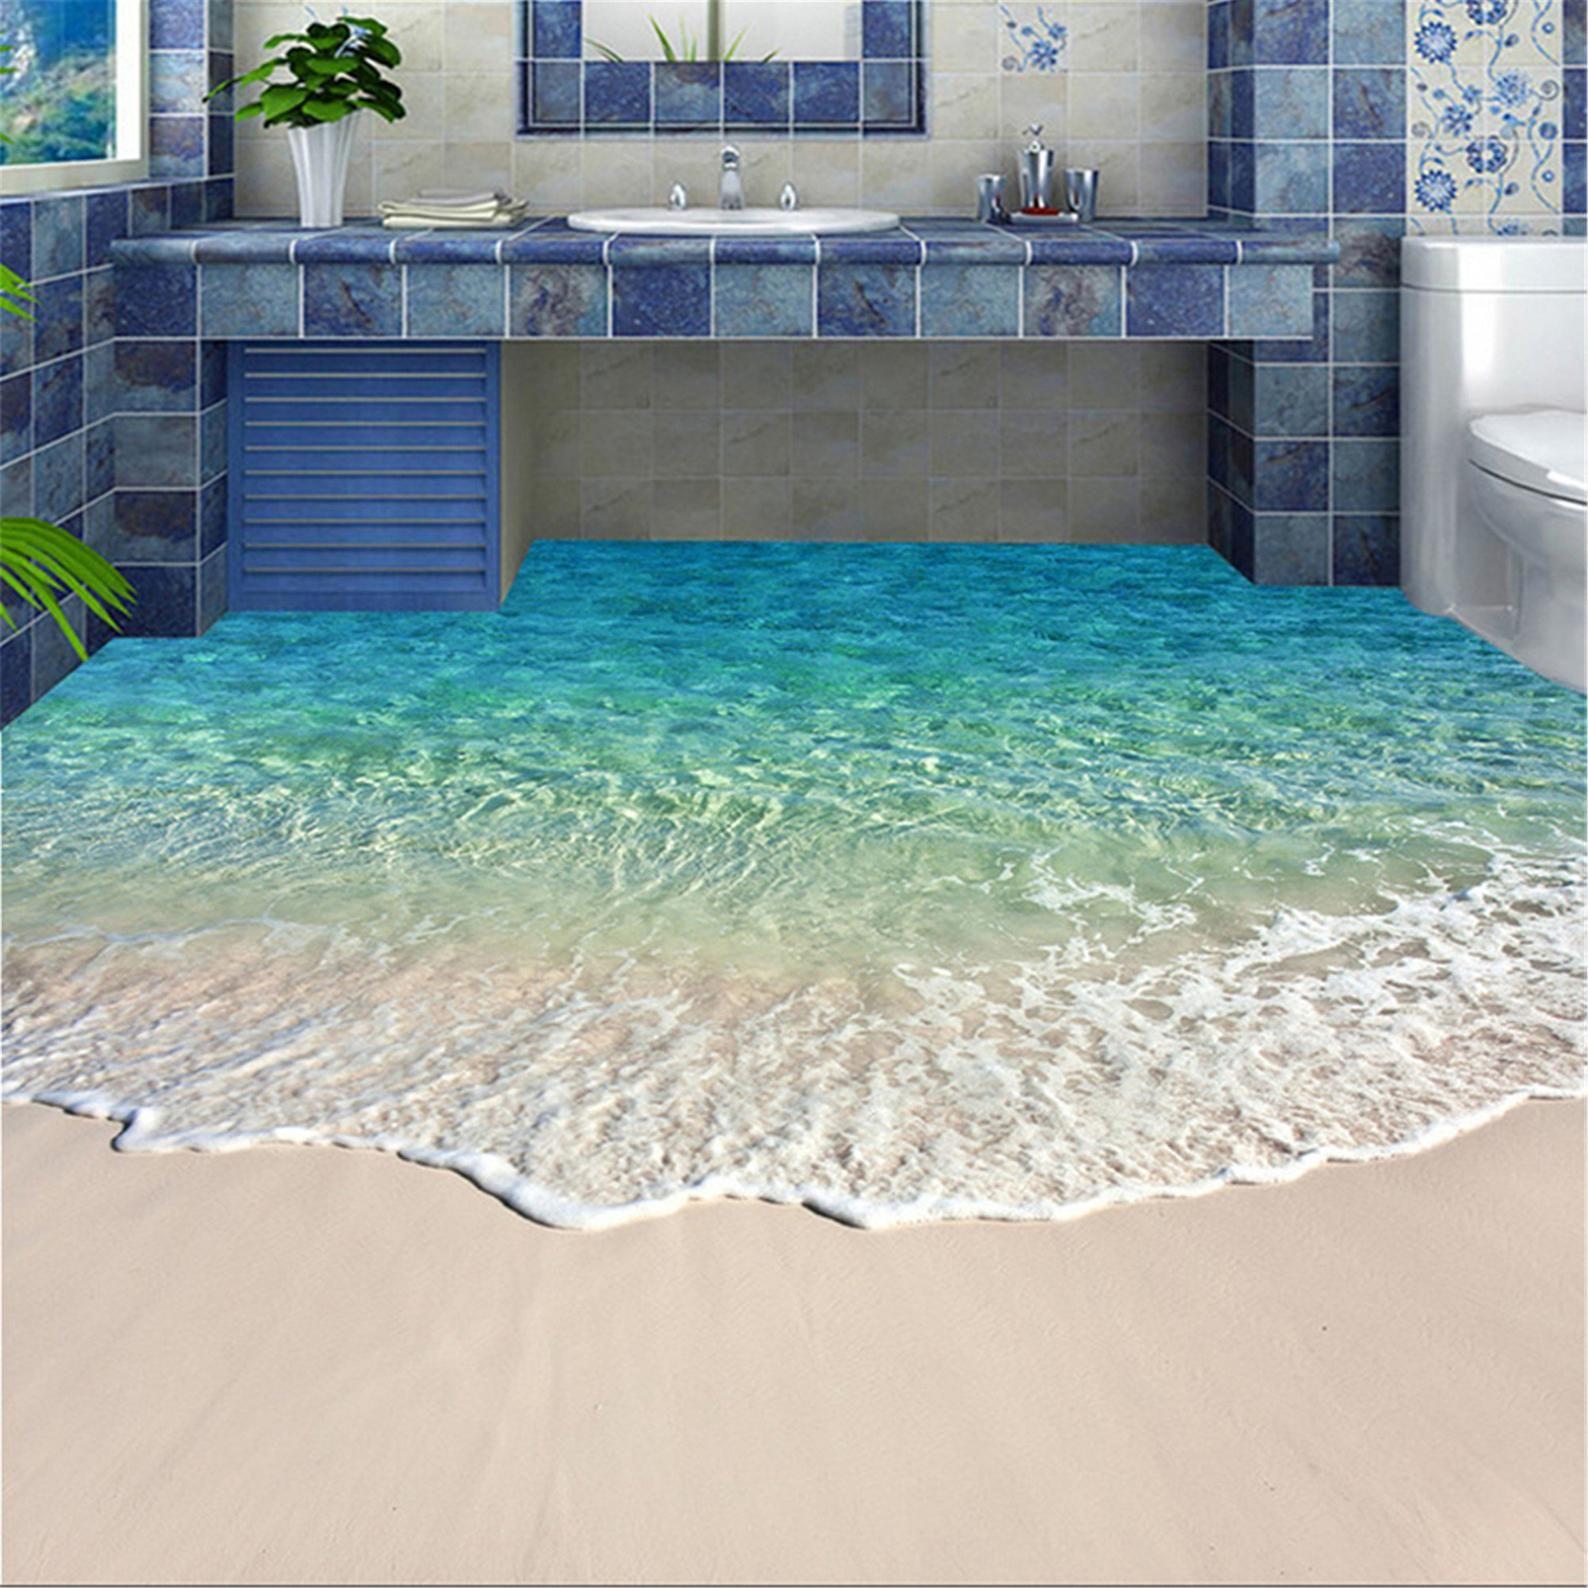 Selfadhesive Floor Mural Photo Wallpaper 3D Seawater Wave